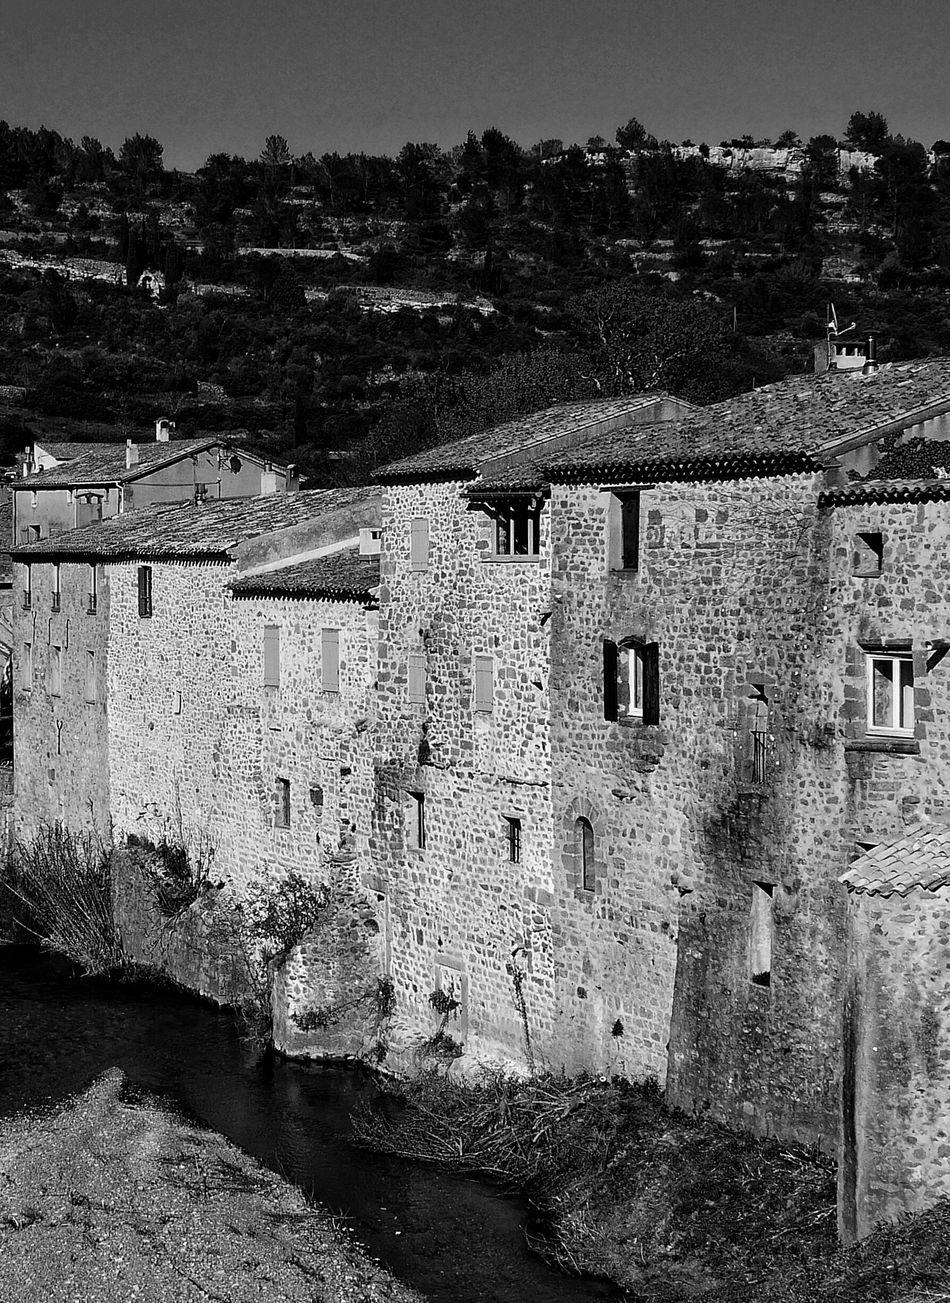 Village Architecture Built Structure Building Exterior Day History Outdoors No People Sky Medieval Ancient Civilization Lagrasse Aude Occitanie River Bridge Old House